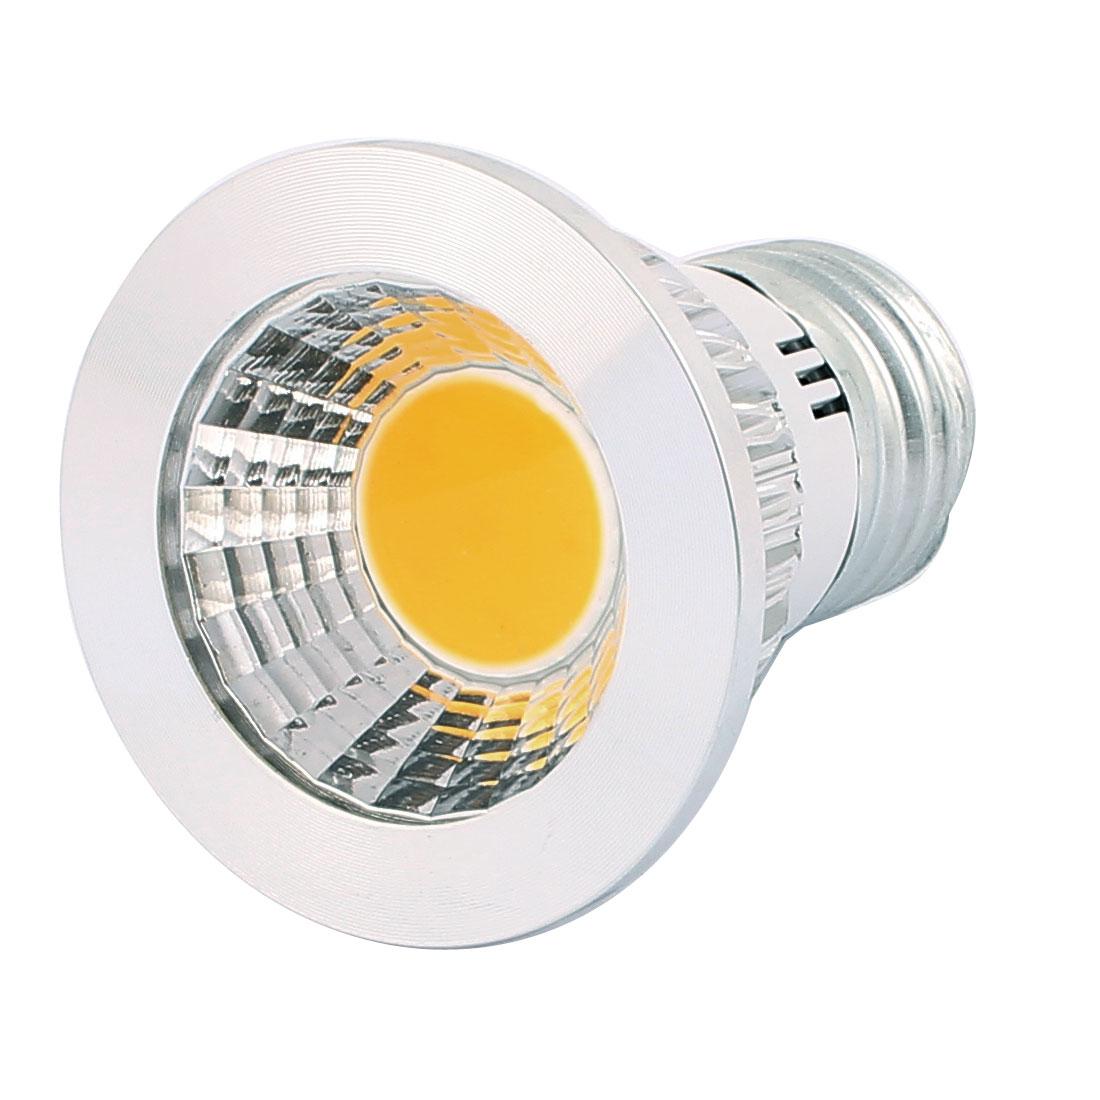 AC85-265V-3W-Power-E27-COB-LED-Spot-Down-Light-Lamp-Energy-Saving-Warm-White